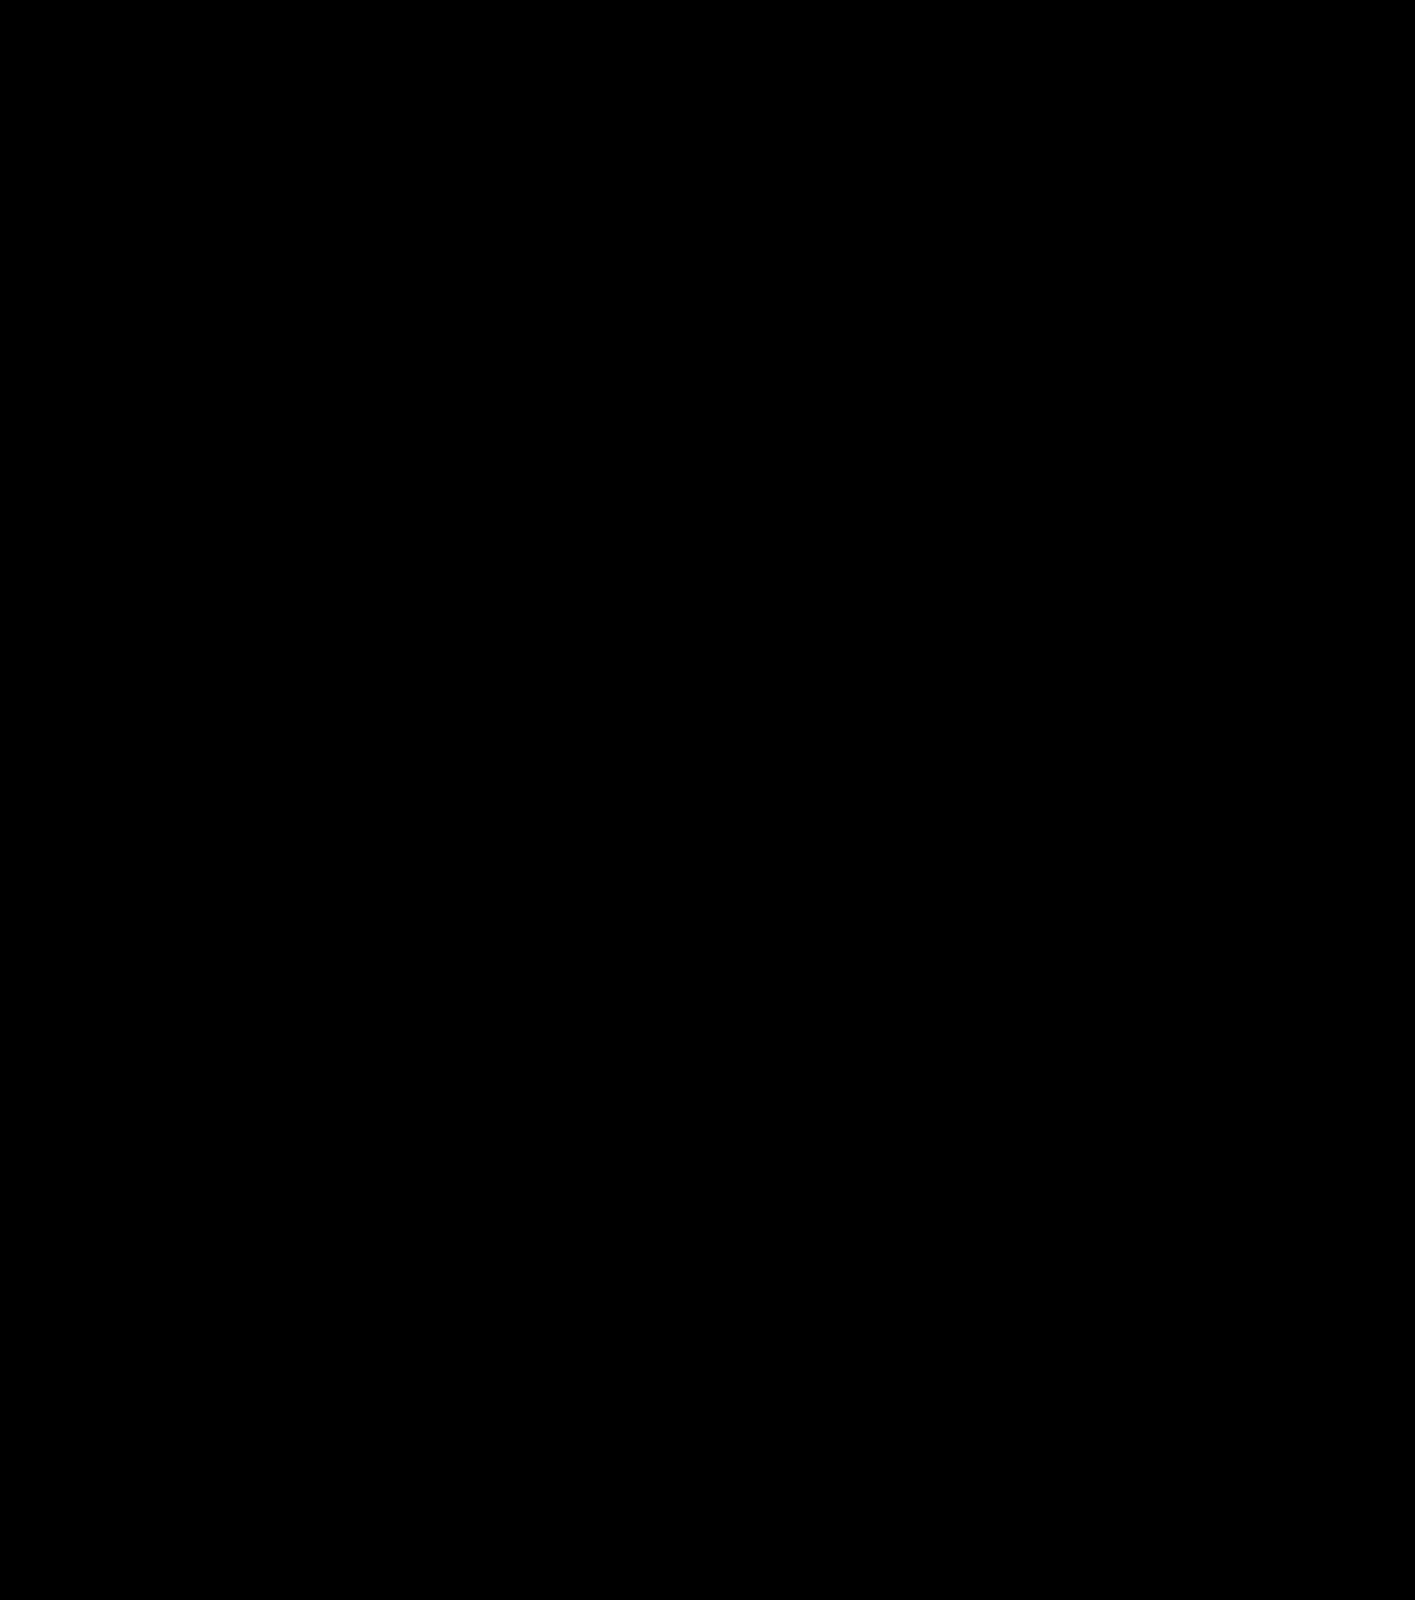 Clipart star hanukkah. Black png free icons